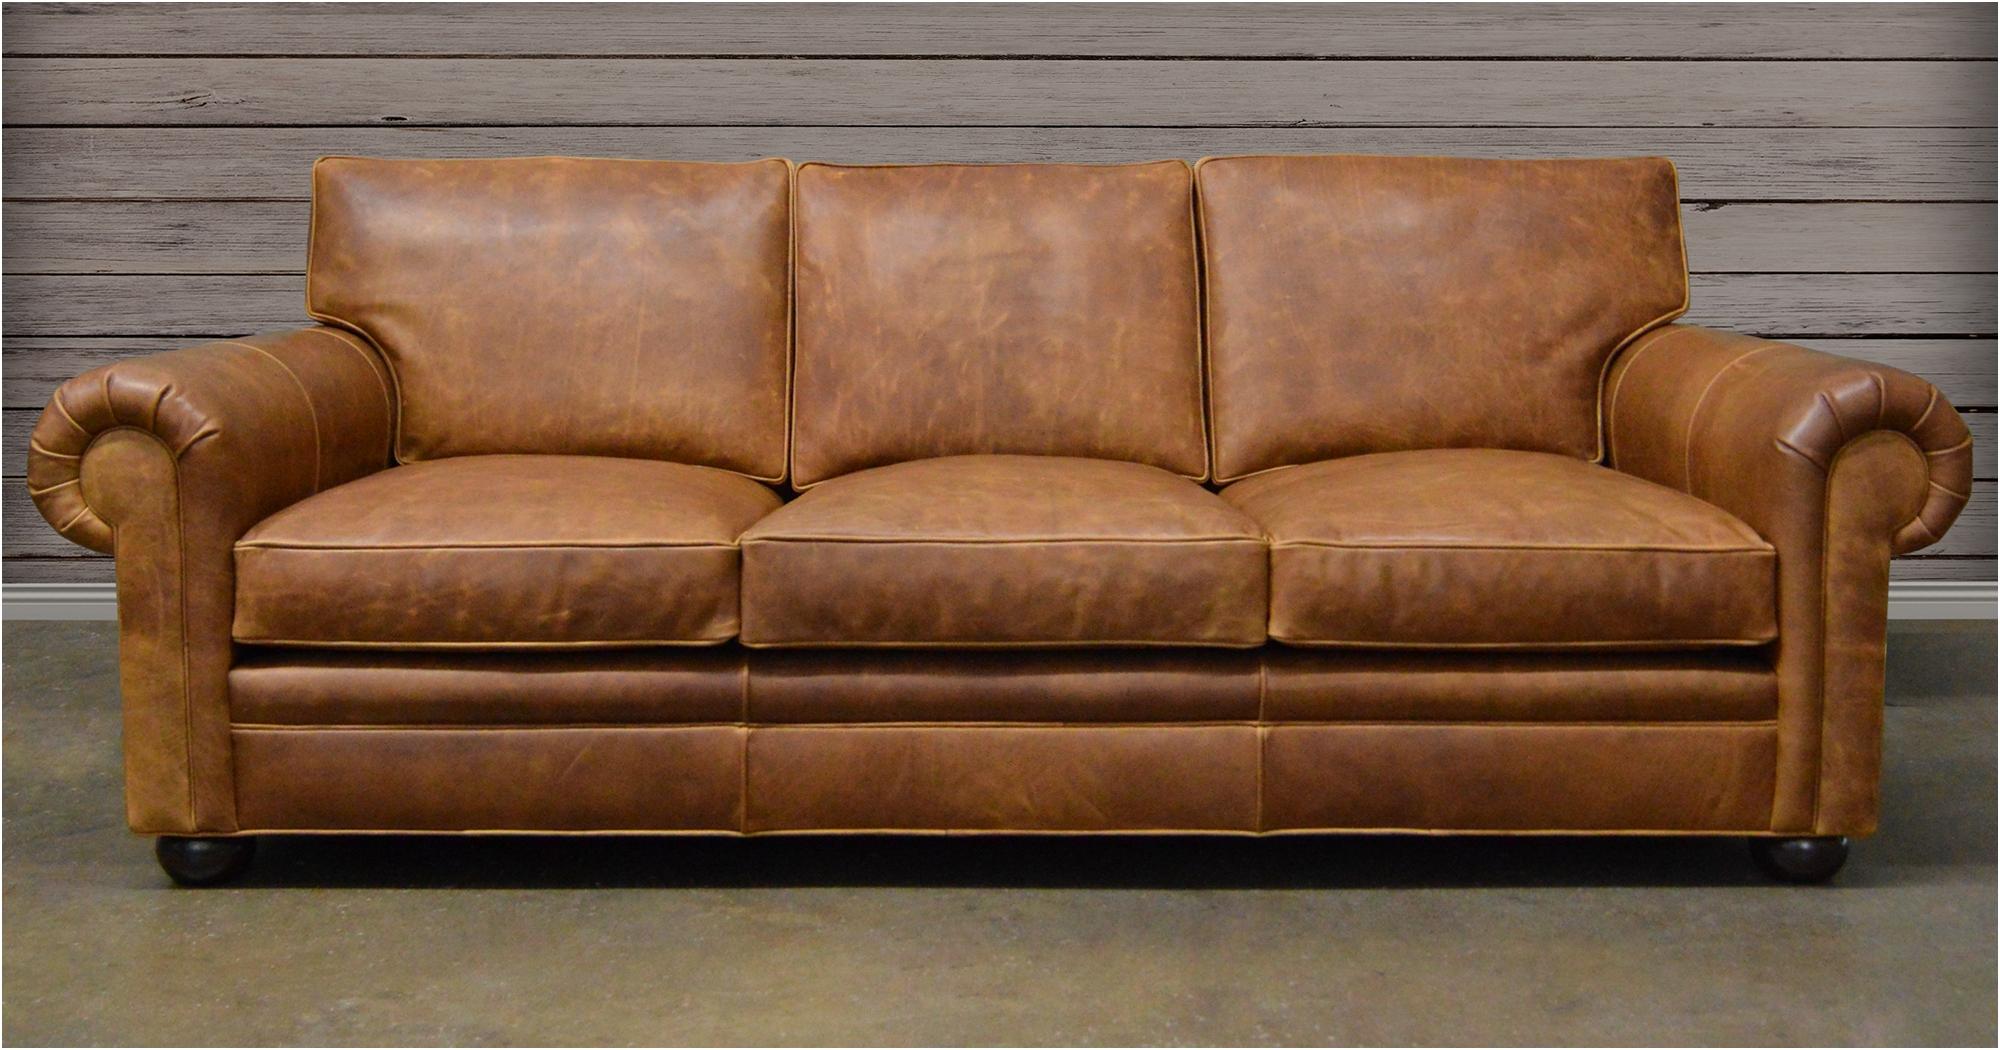 Custom Leather Sofas Houston Tx Centerfieldbar Com Sofa Furniture throughout Dallas Texas Sectional Sofas (Image 4 of 10)